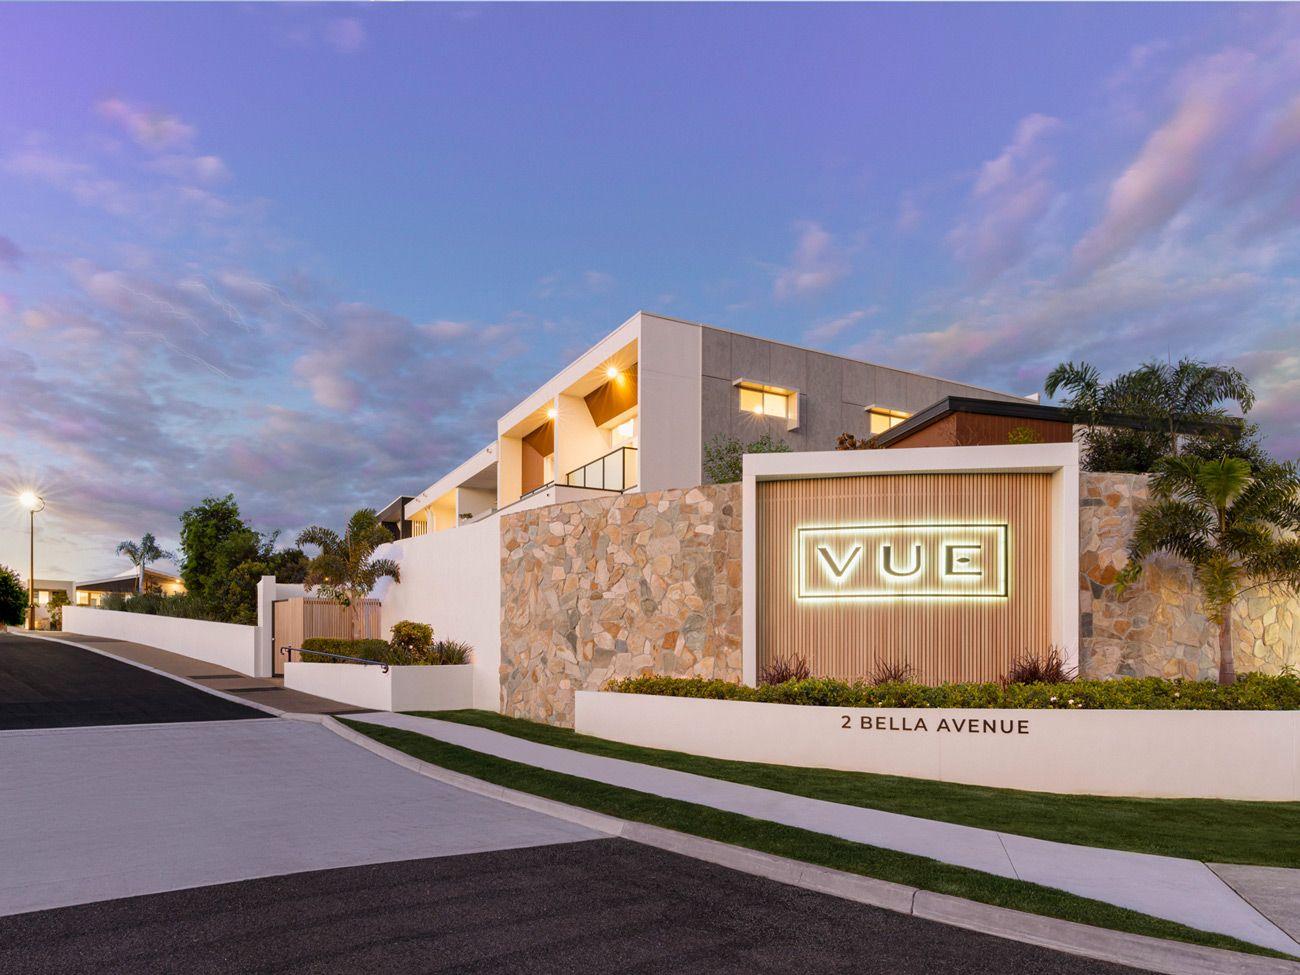 1 East Lane, Robina, QLD 4226, Image 0